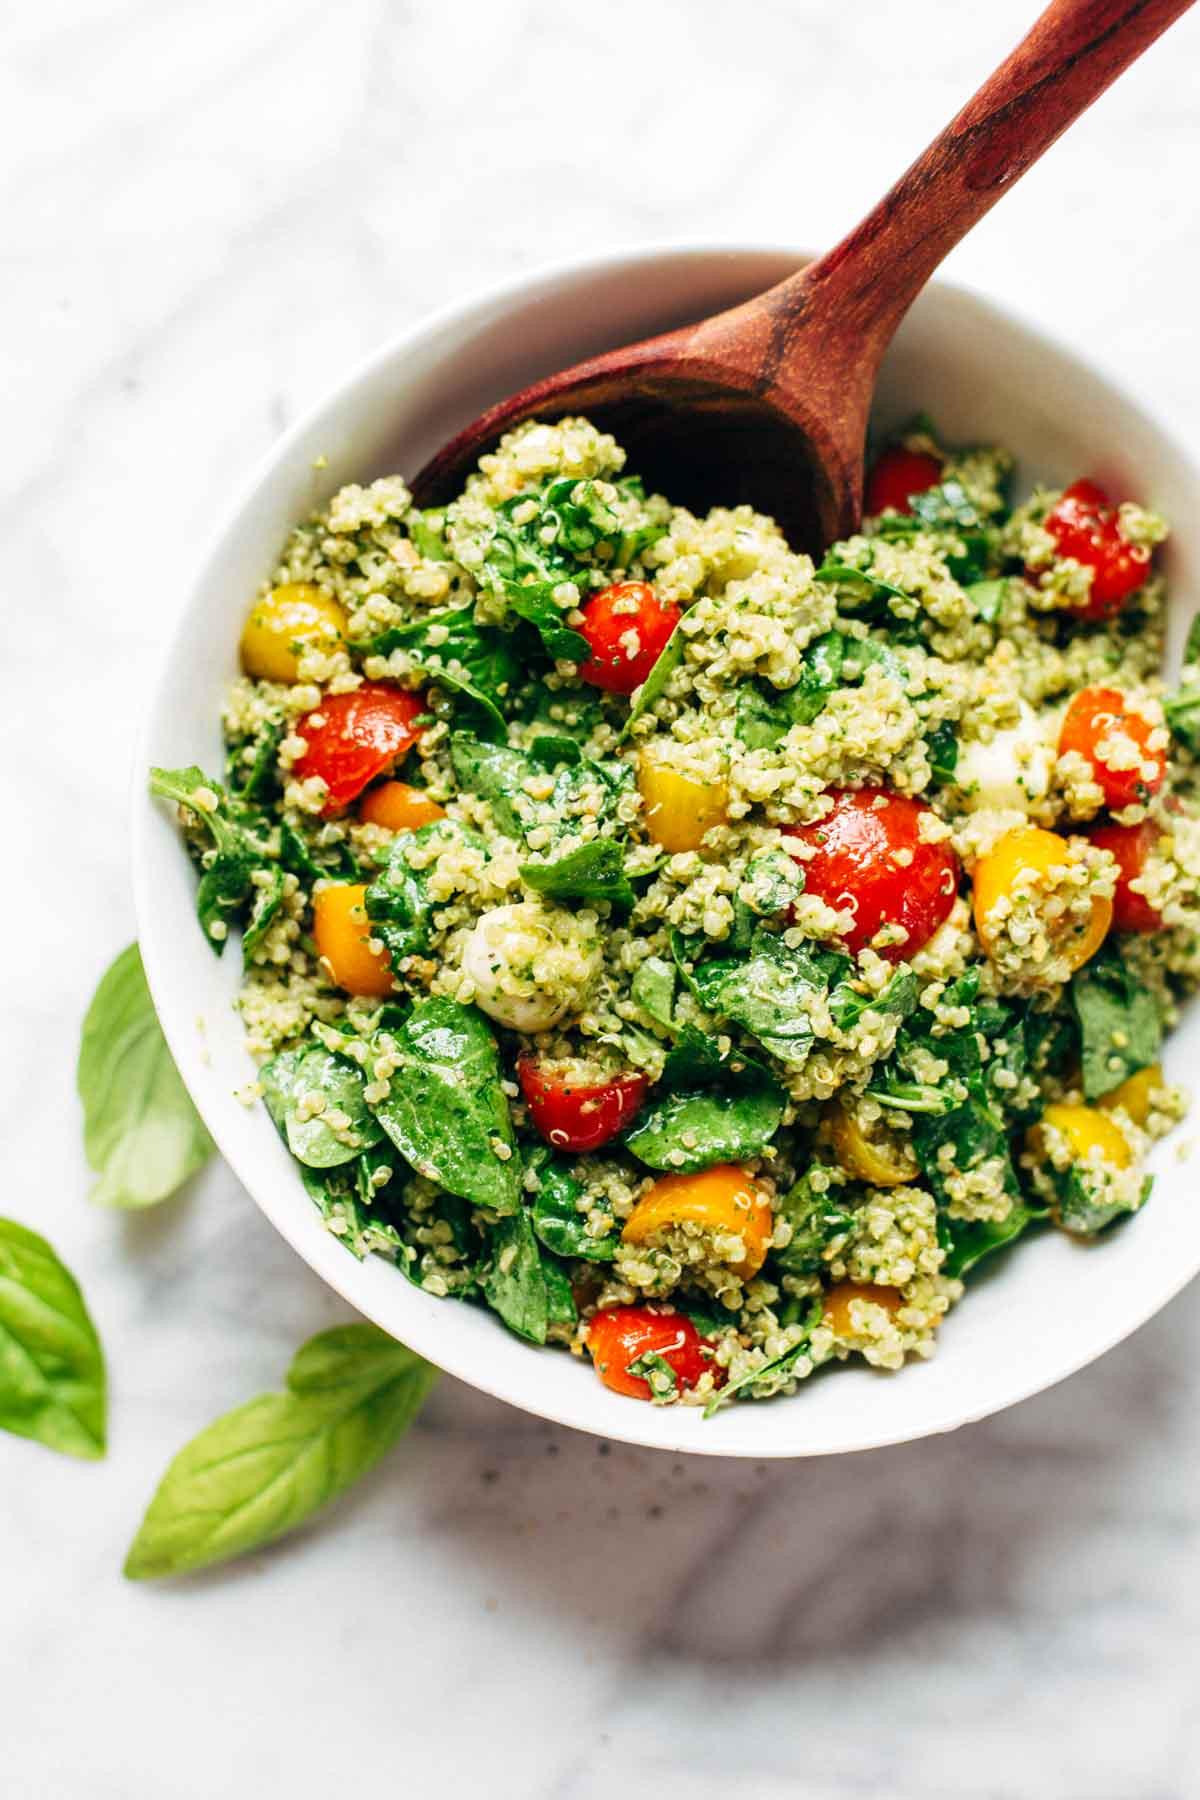 Summer Vegan Recipes  Green Goddess Quinoa Summer Salad Recipe Pinch of Yum